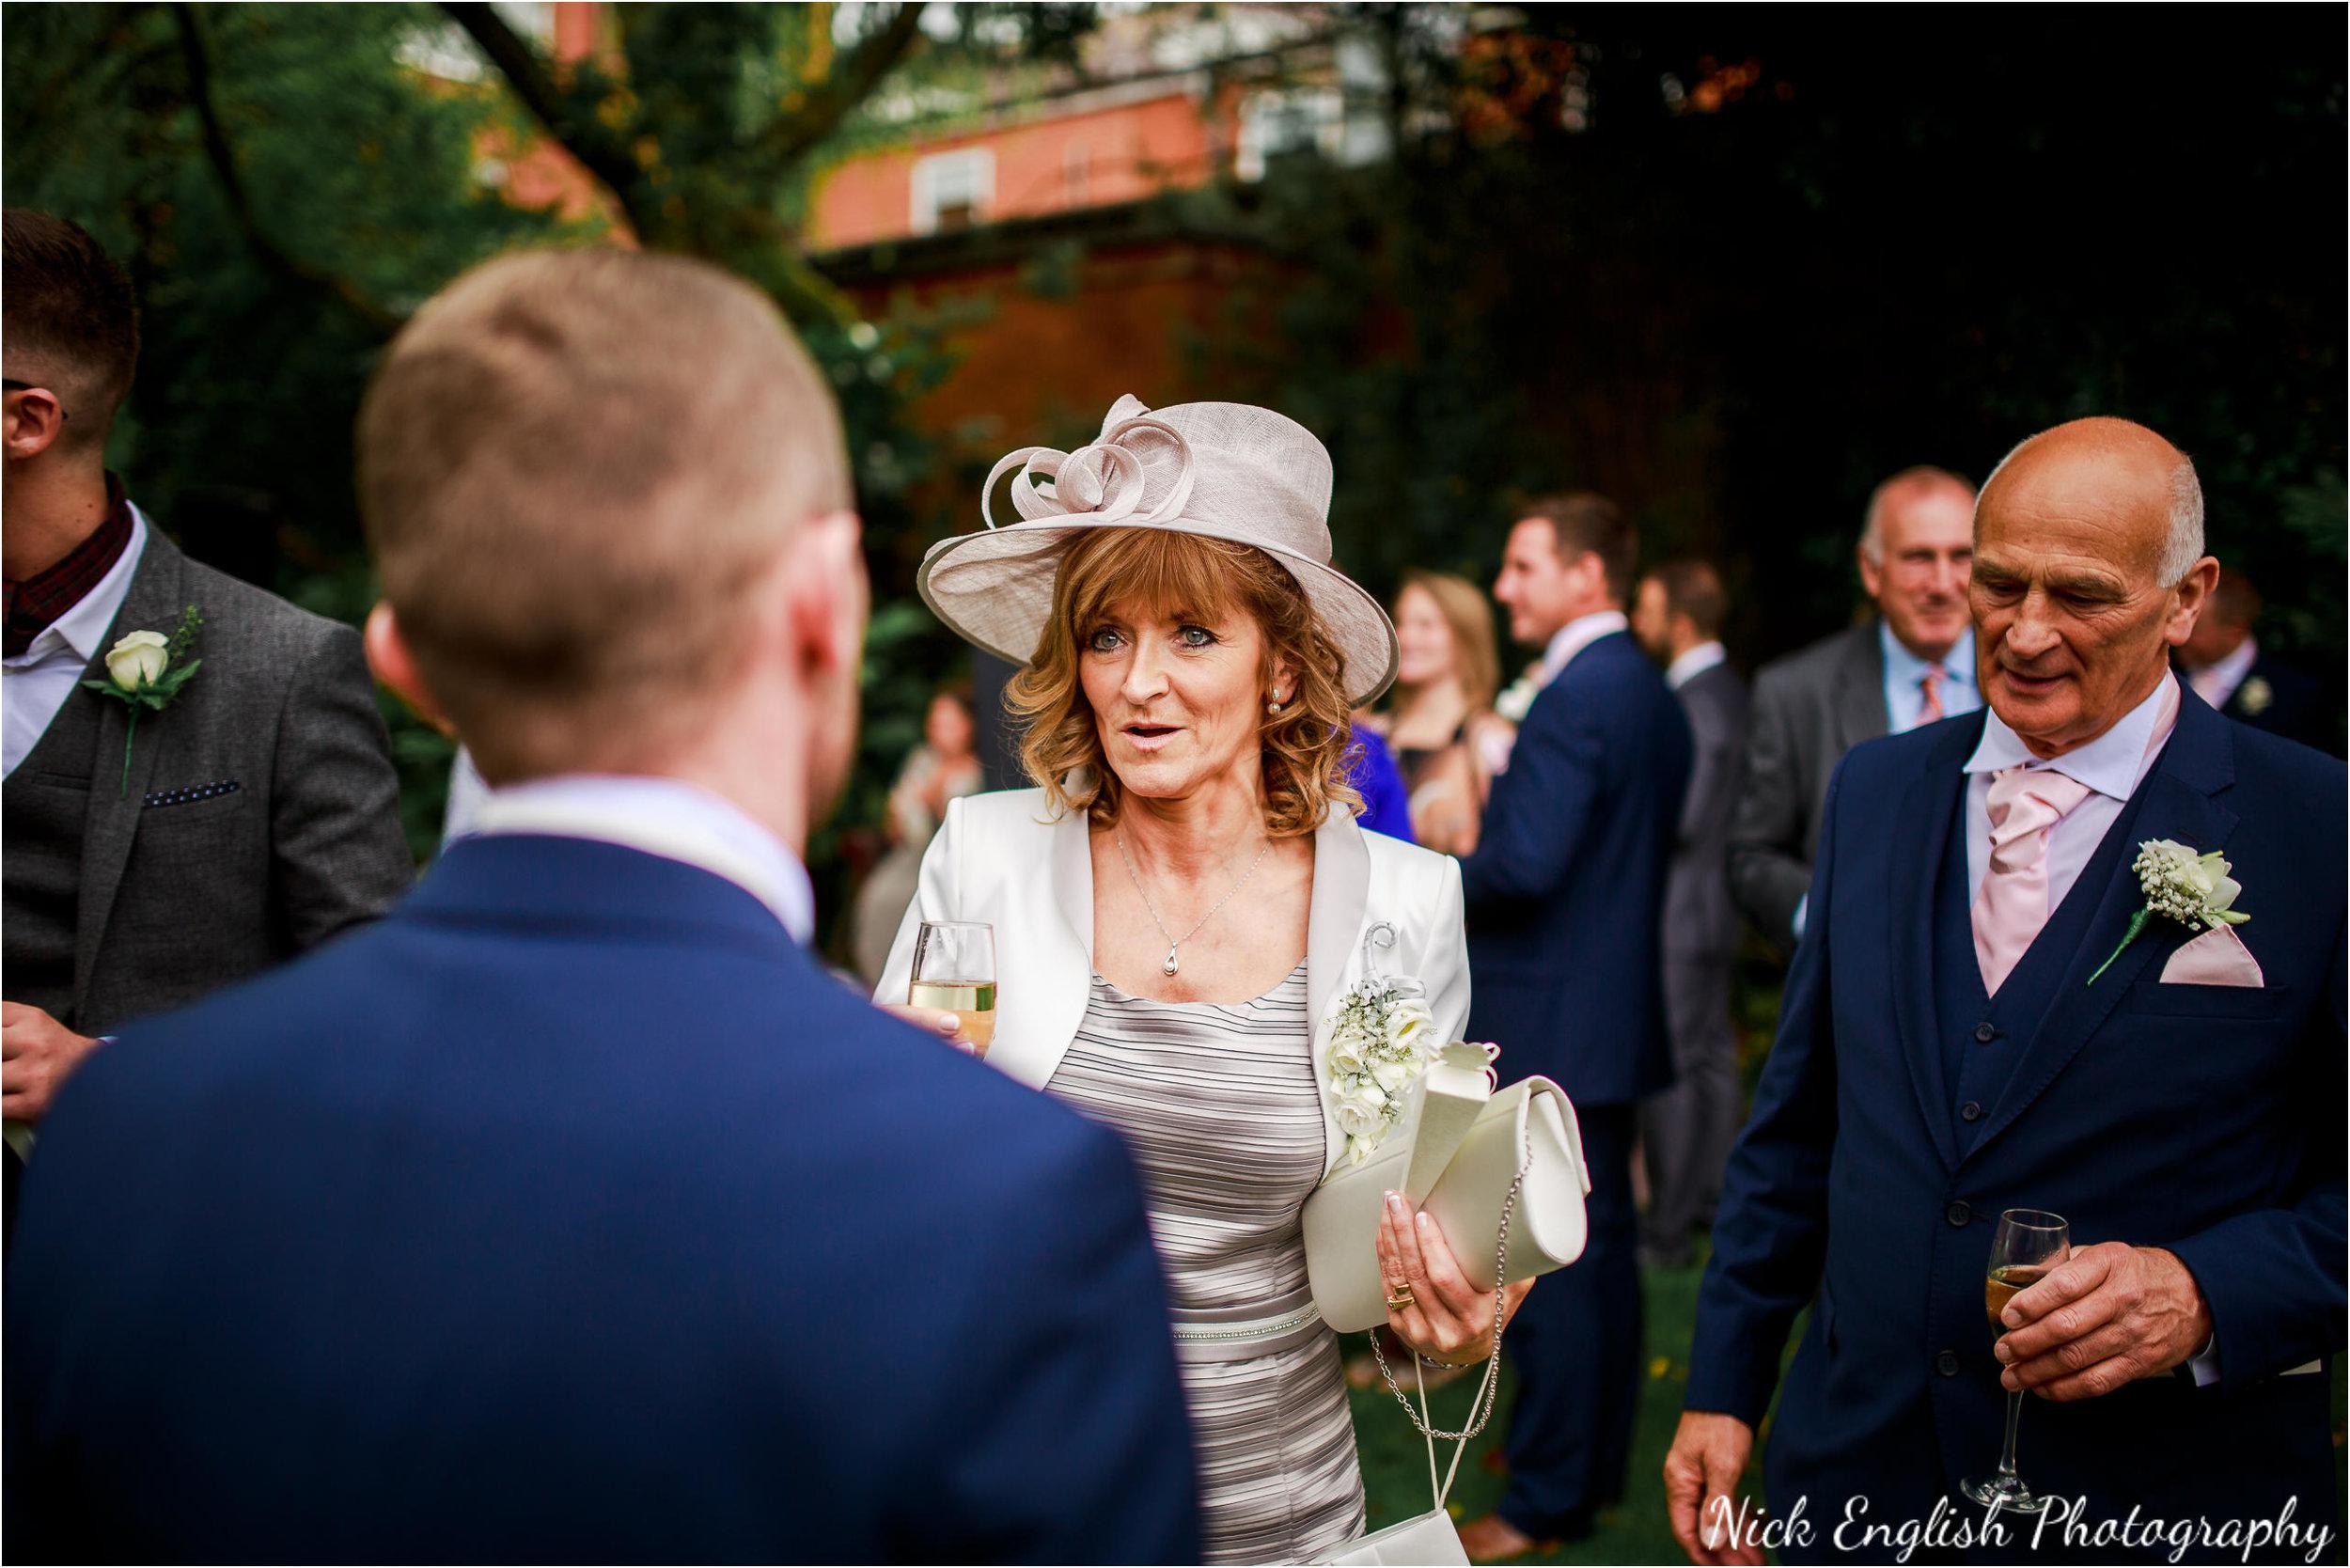 Emily David Wedding Photographs at Barton Grange Preston by Nick English Photography 97jpg.jpeg